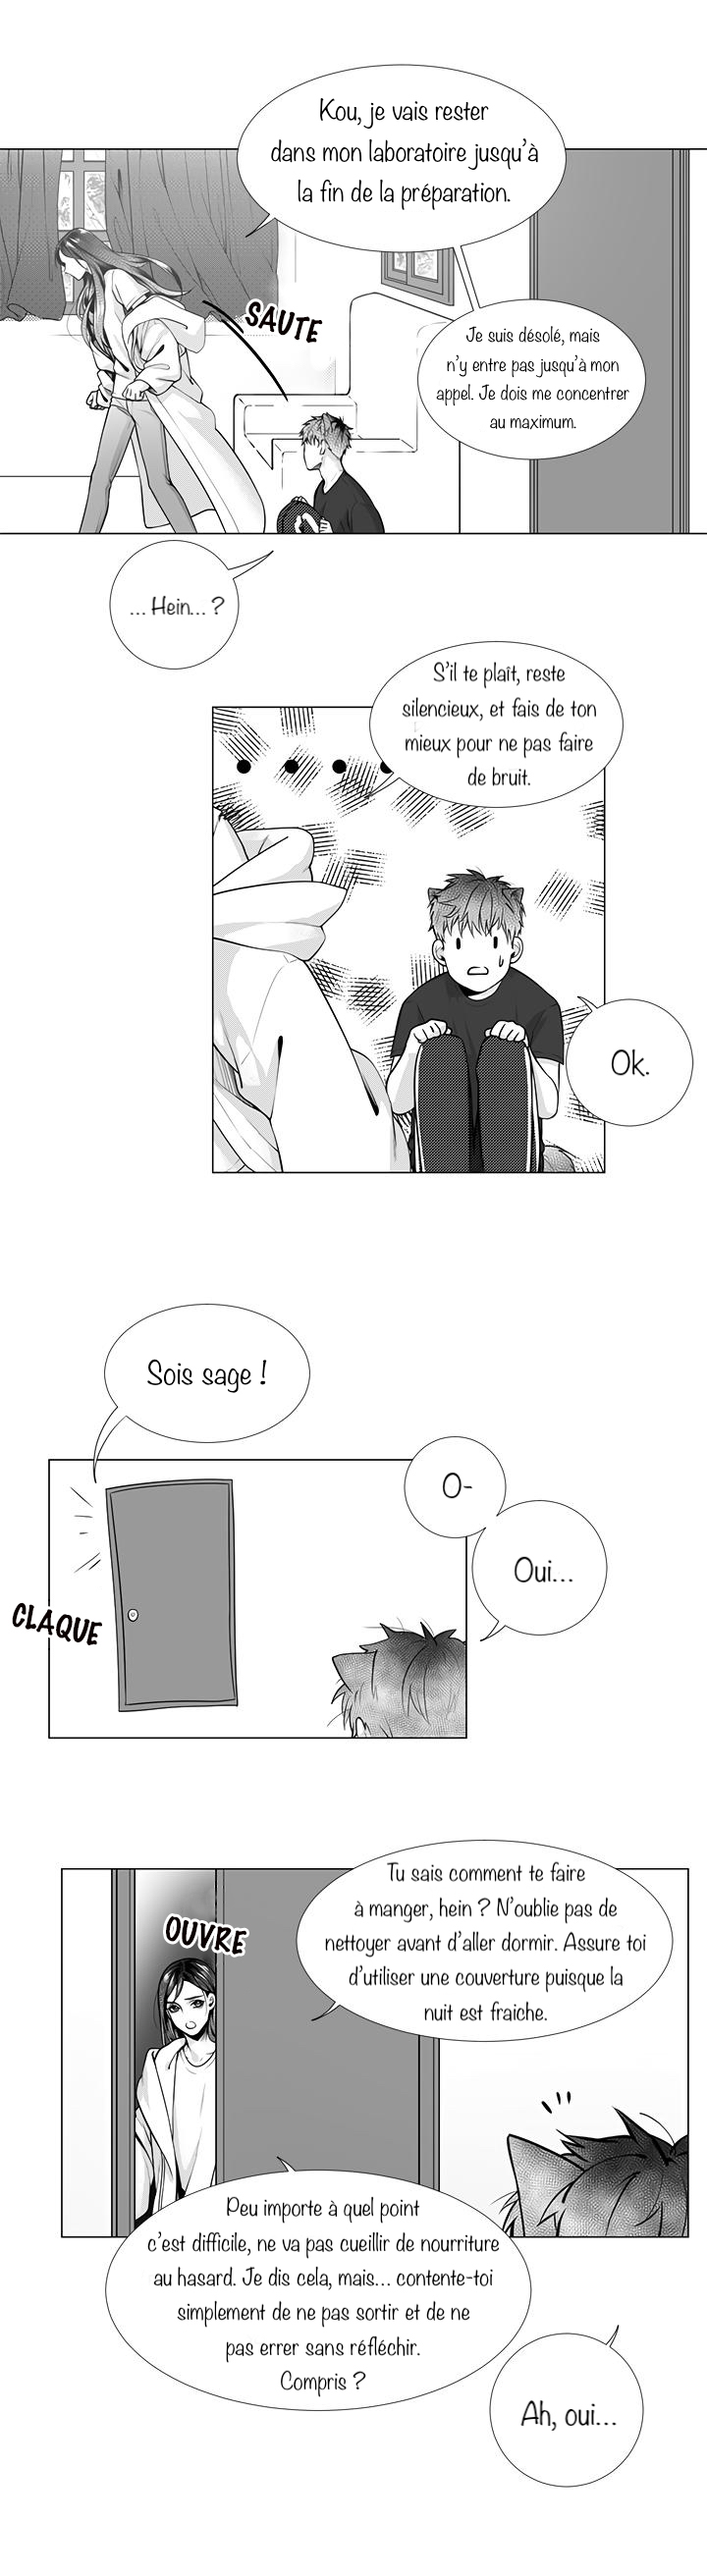 https://nine.mangadogs.com/fr_manga/pic2/59/11515/518618/e32084632d369461572832e6582aac36.jpg Page 11